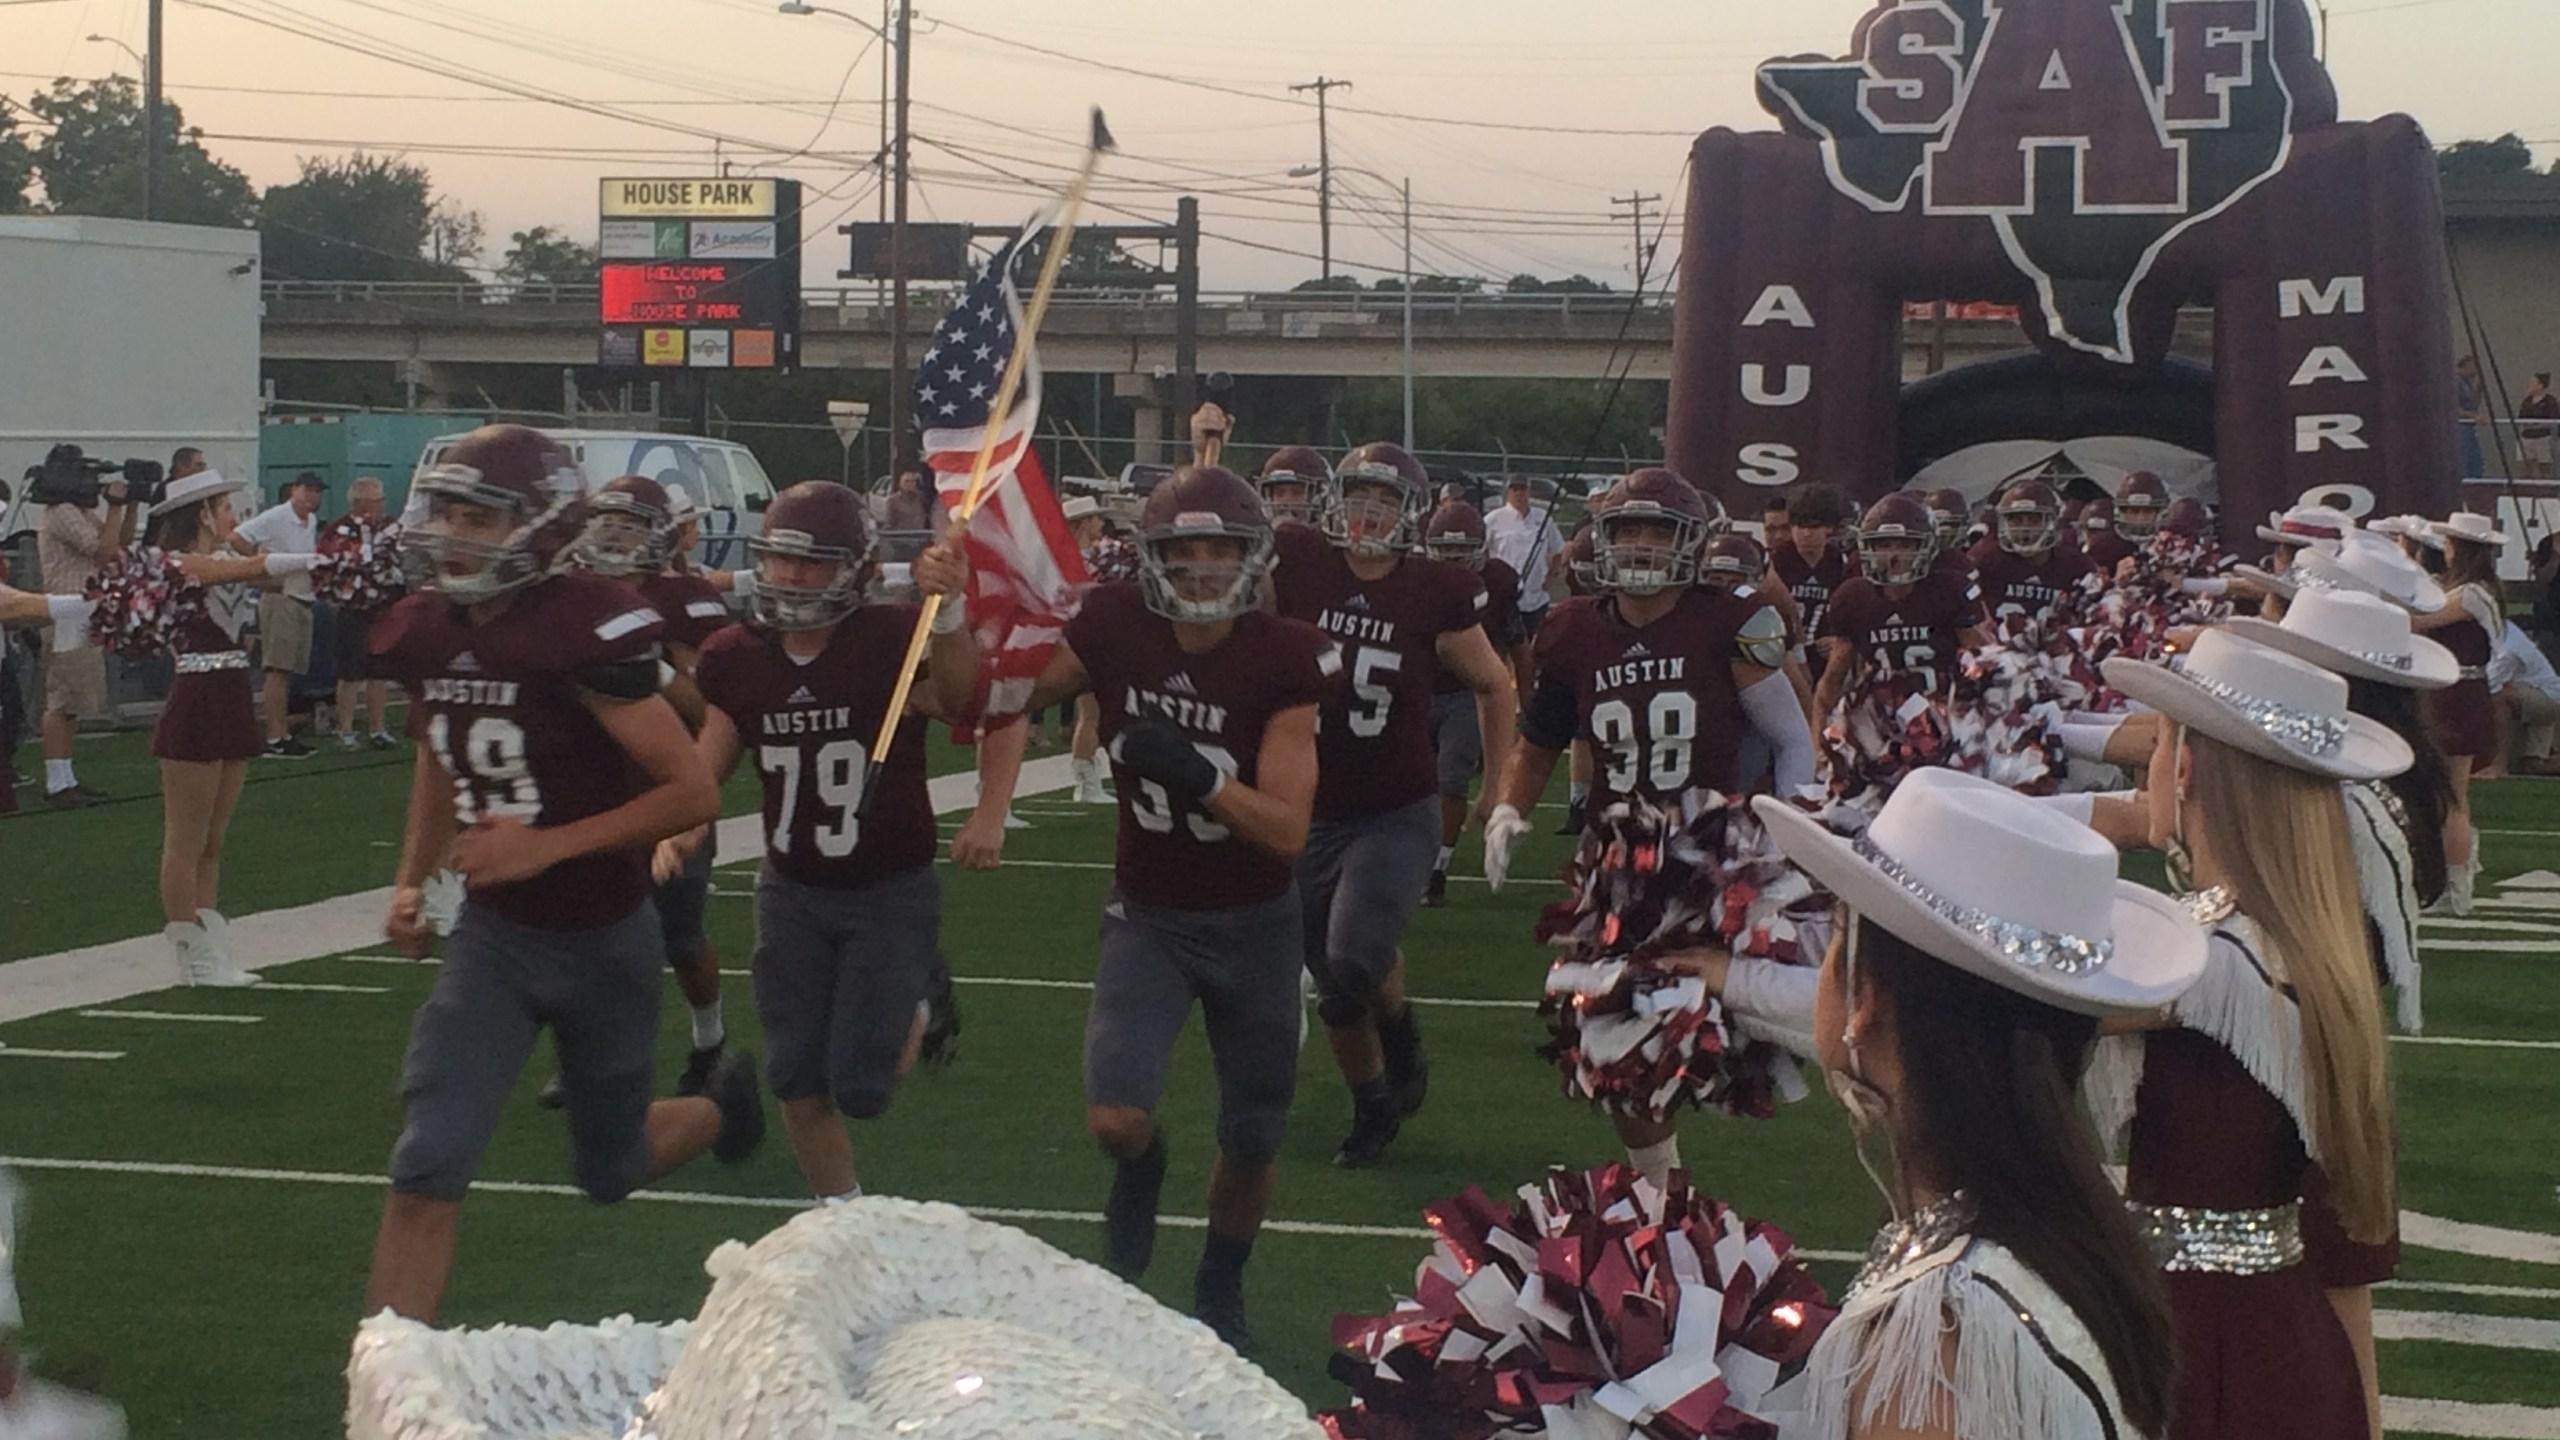 Austin High School Football team entering_349202